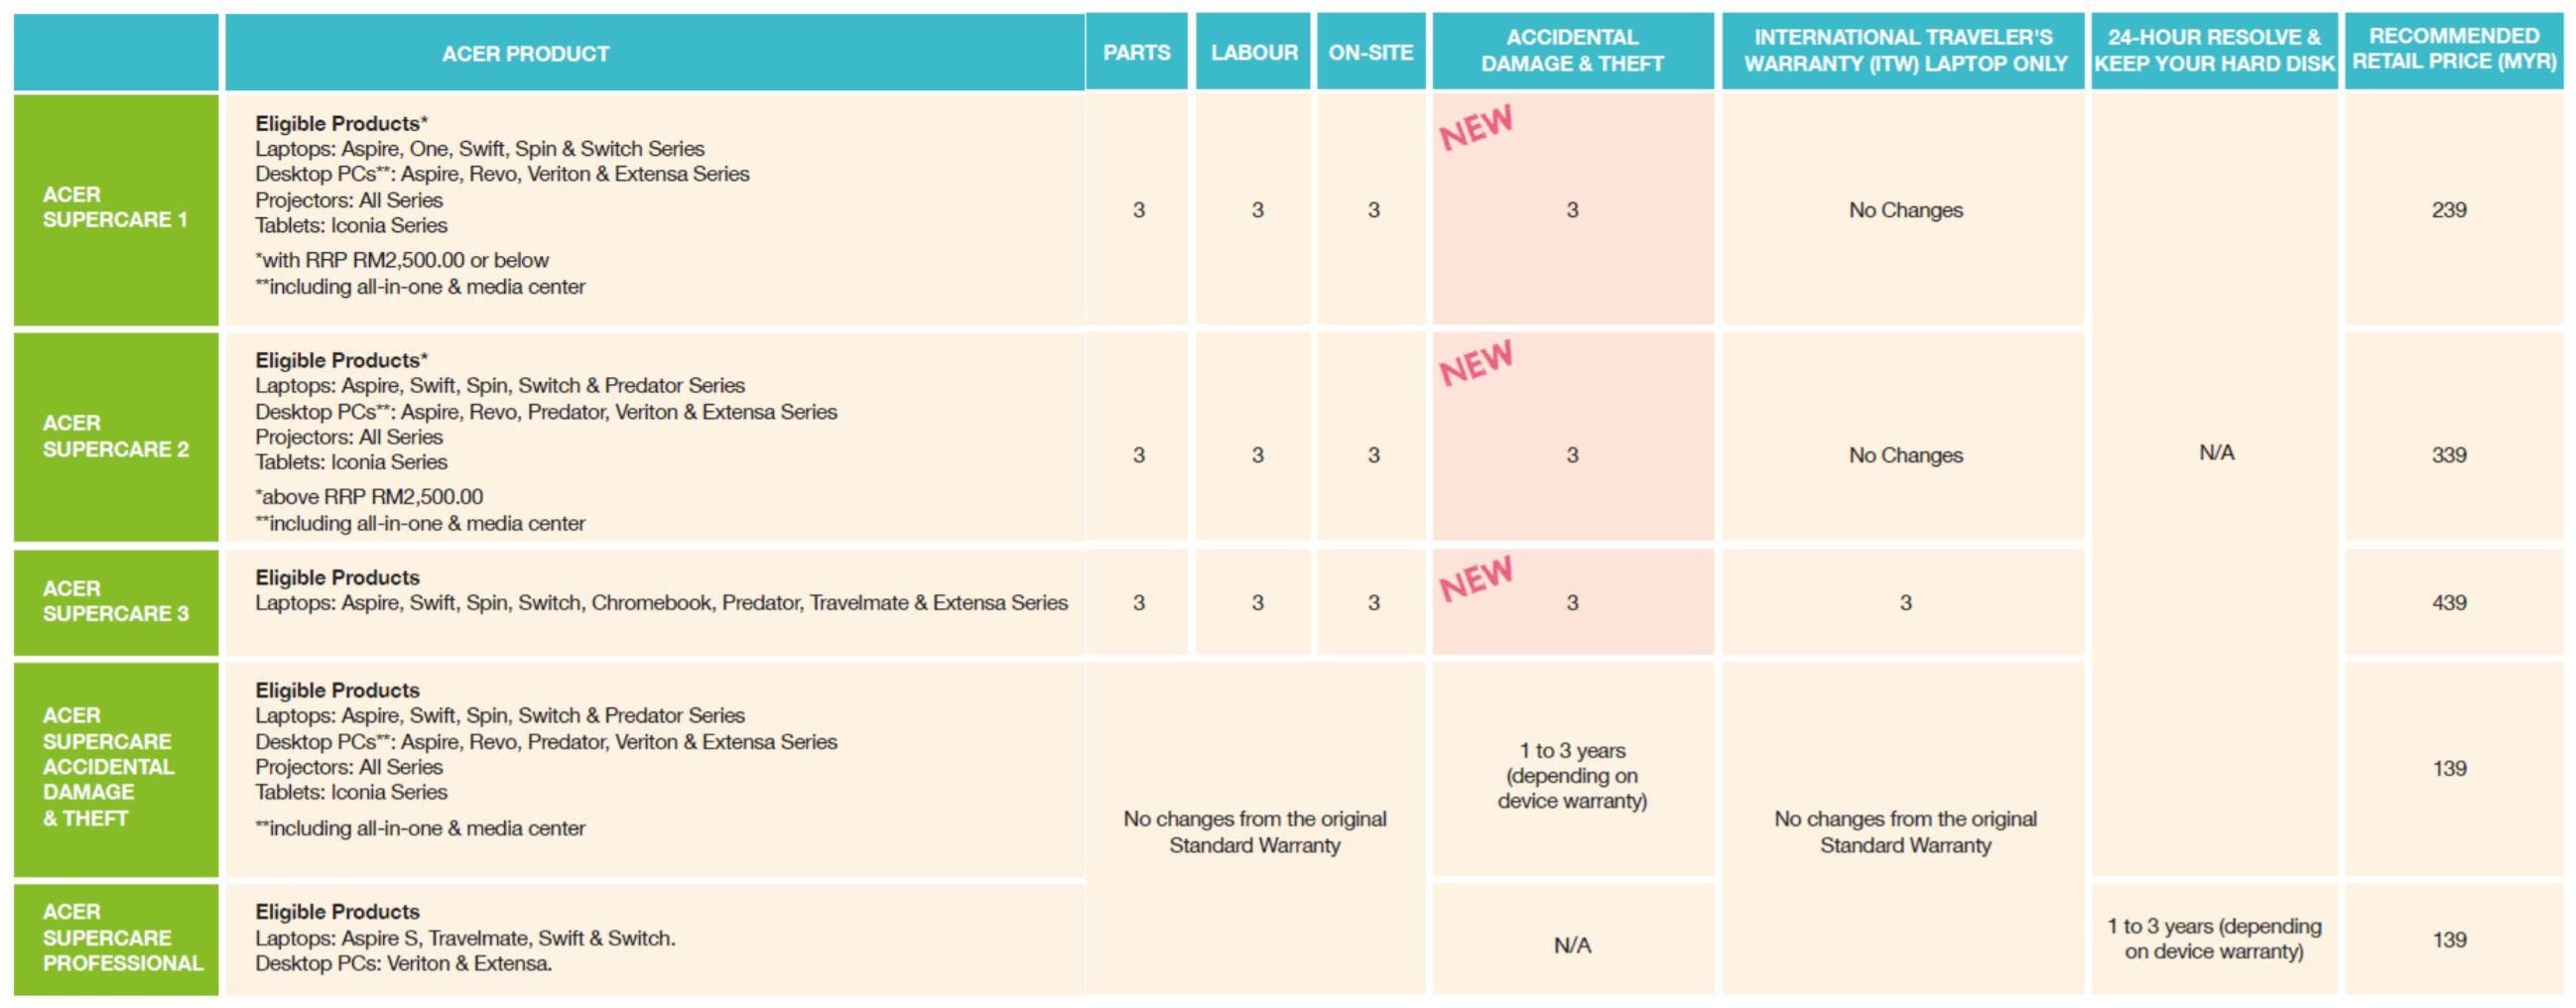 acer-supercare-warranty-2016-breakdown-malaysia